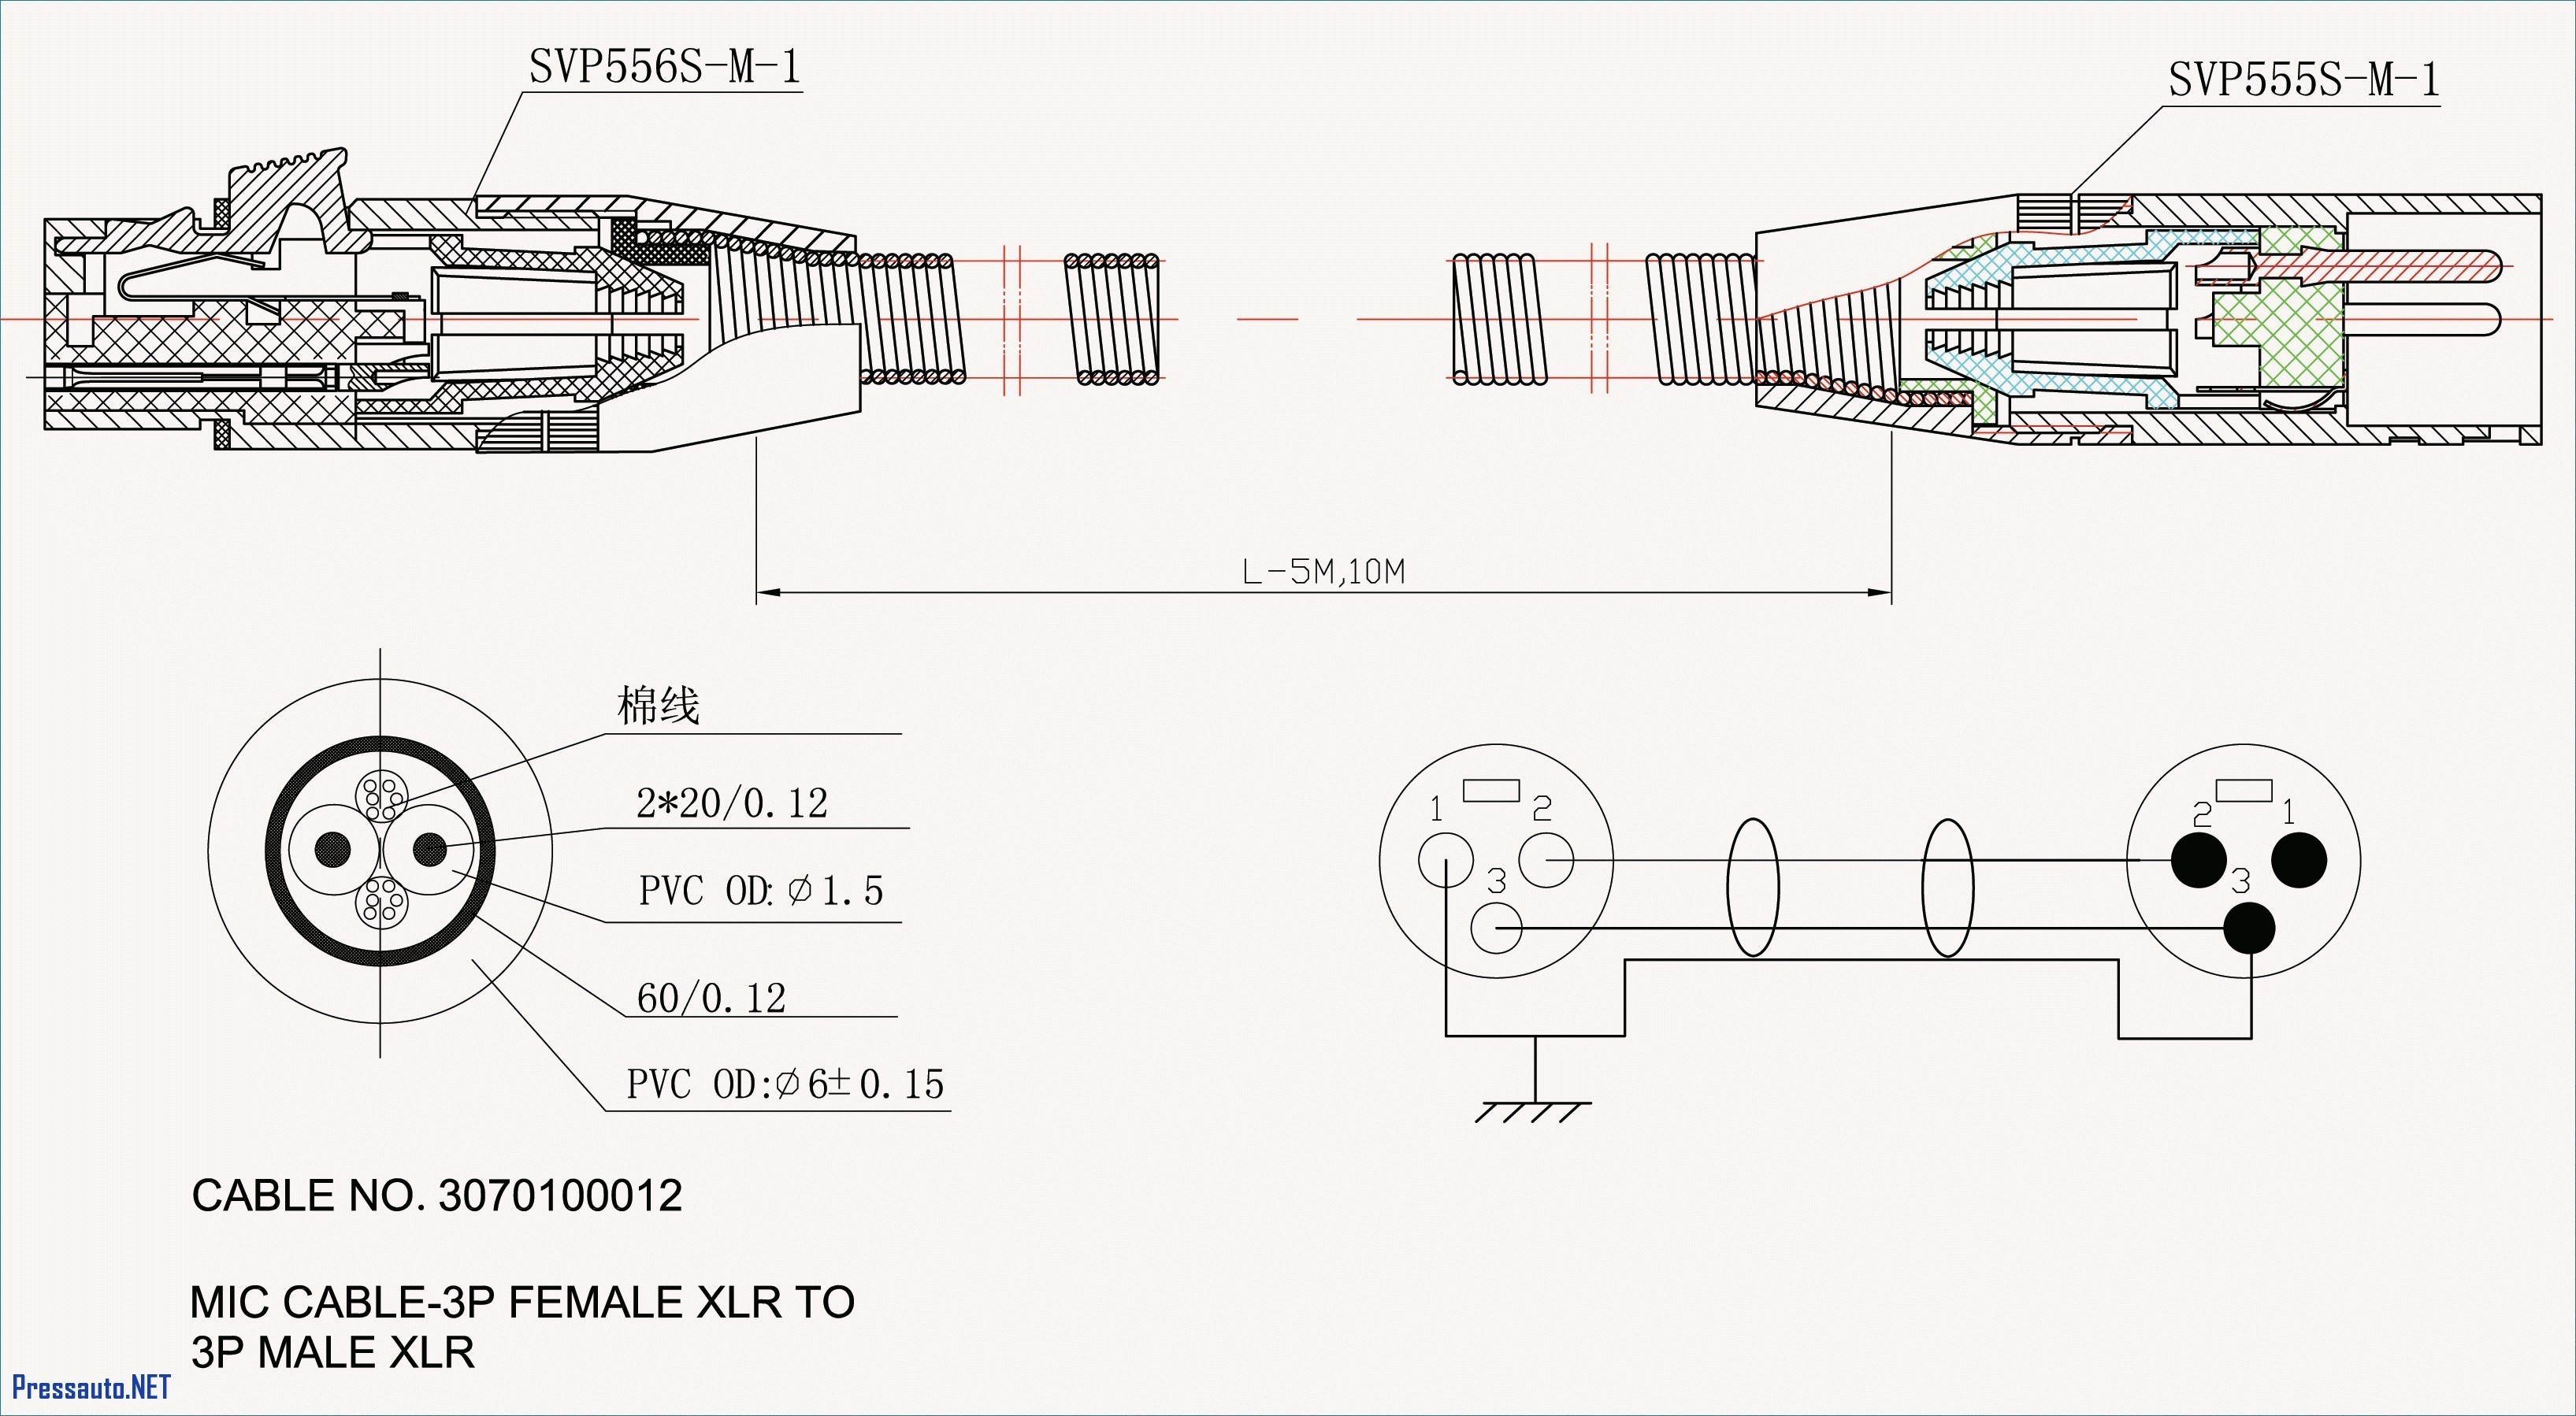 sa 200 wiring diagram new alternator for lincoln sa 200 ipphil of sa 200 wiring diagram